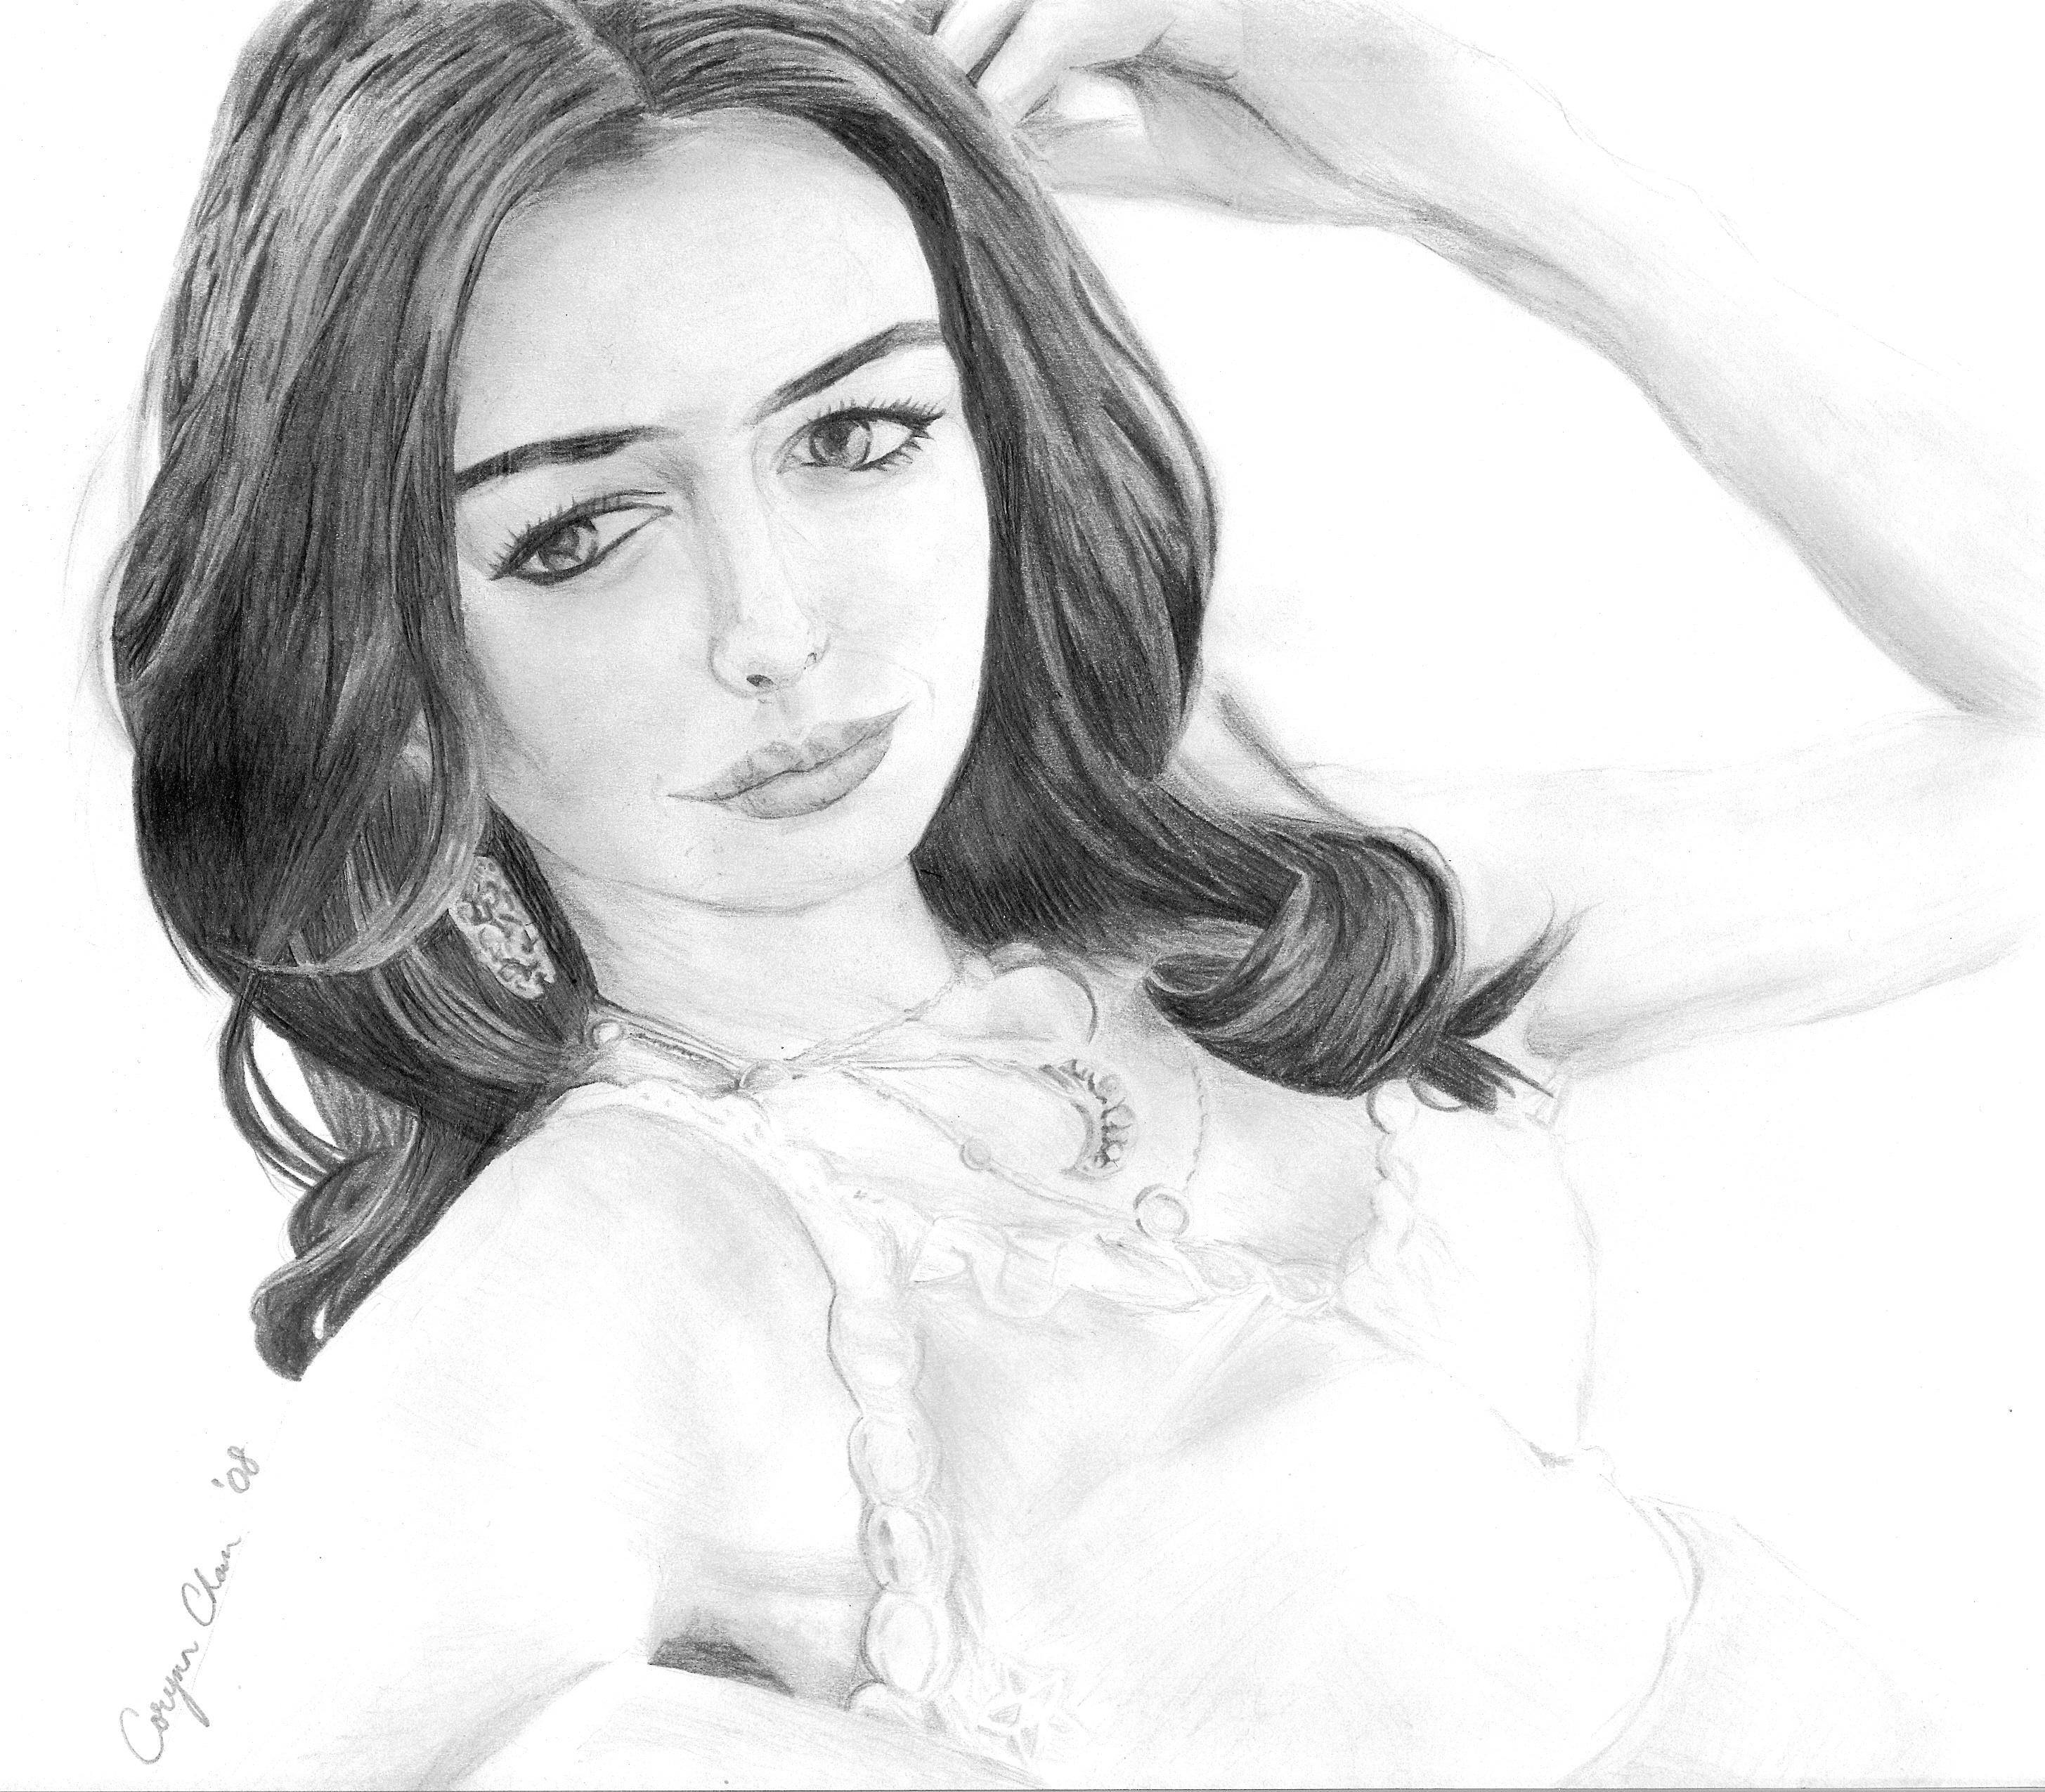 Anne Hathaway Drawing: Anne Hathaway -sketch By Corynnchan On DeviantArt